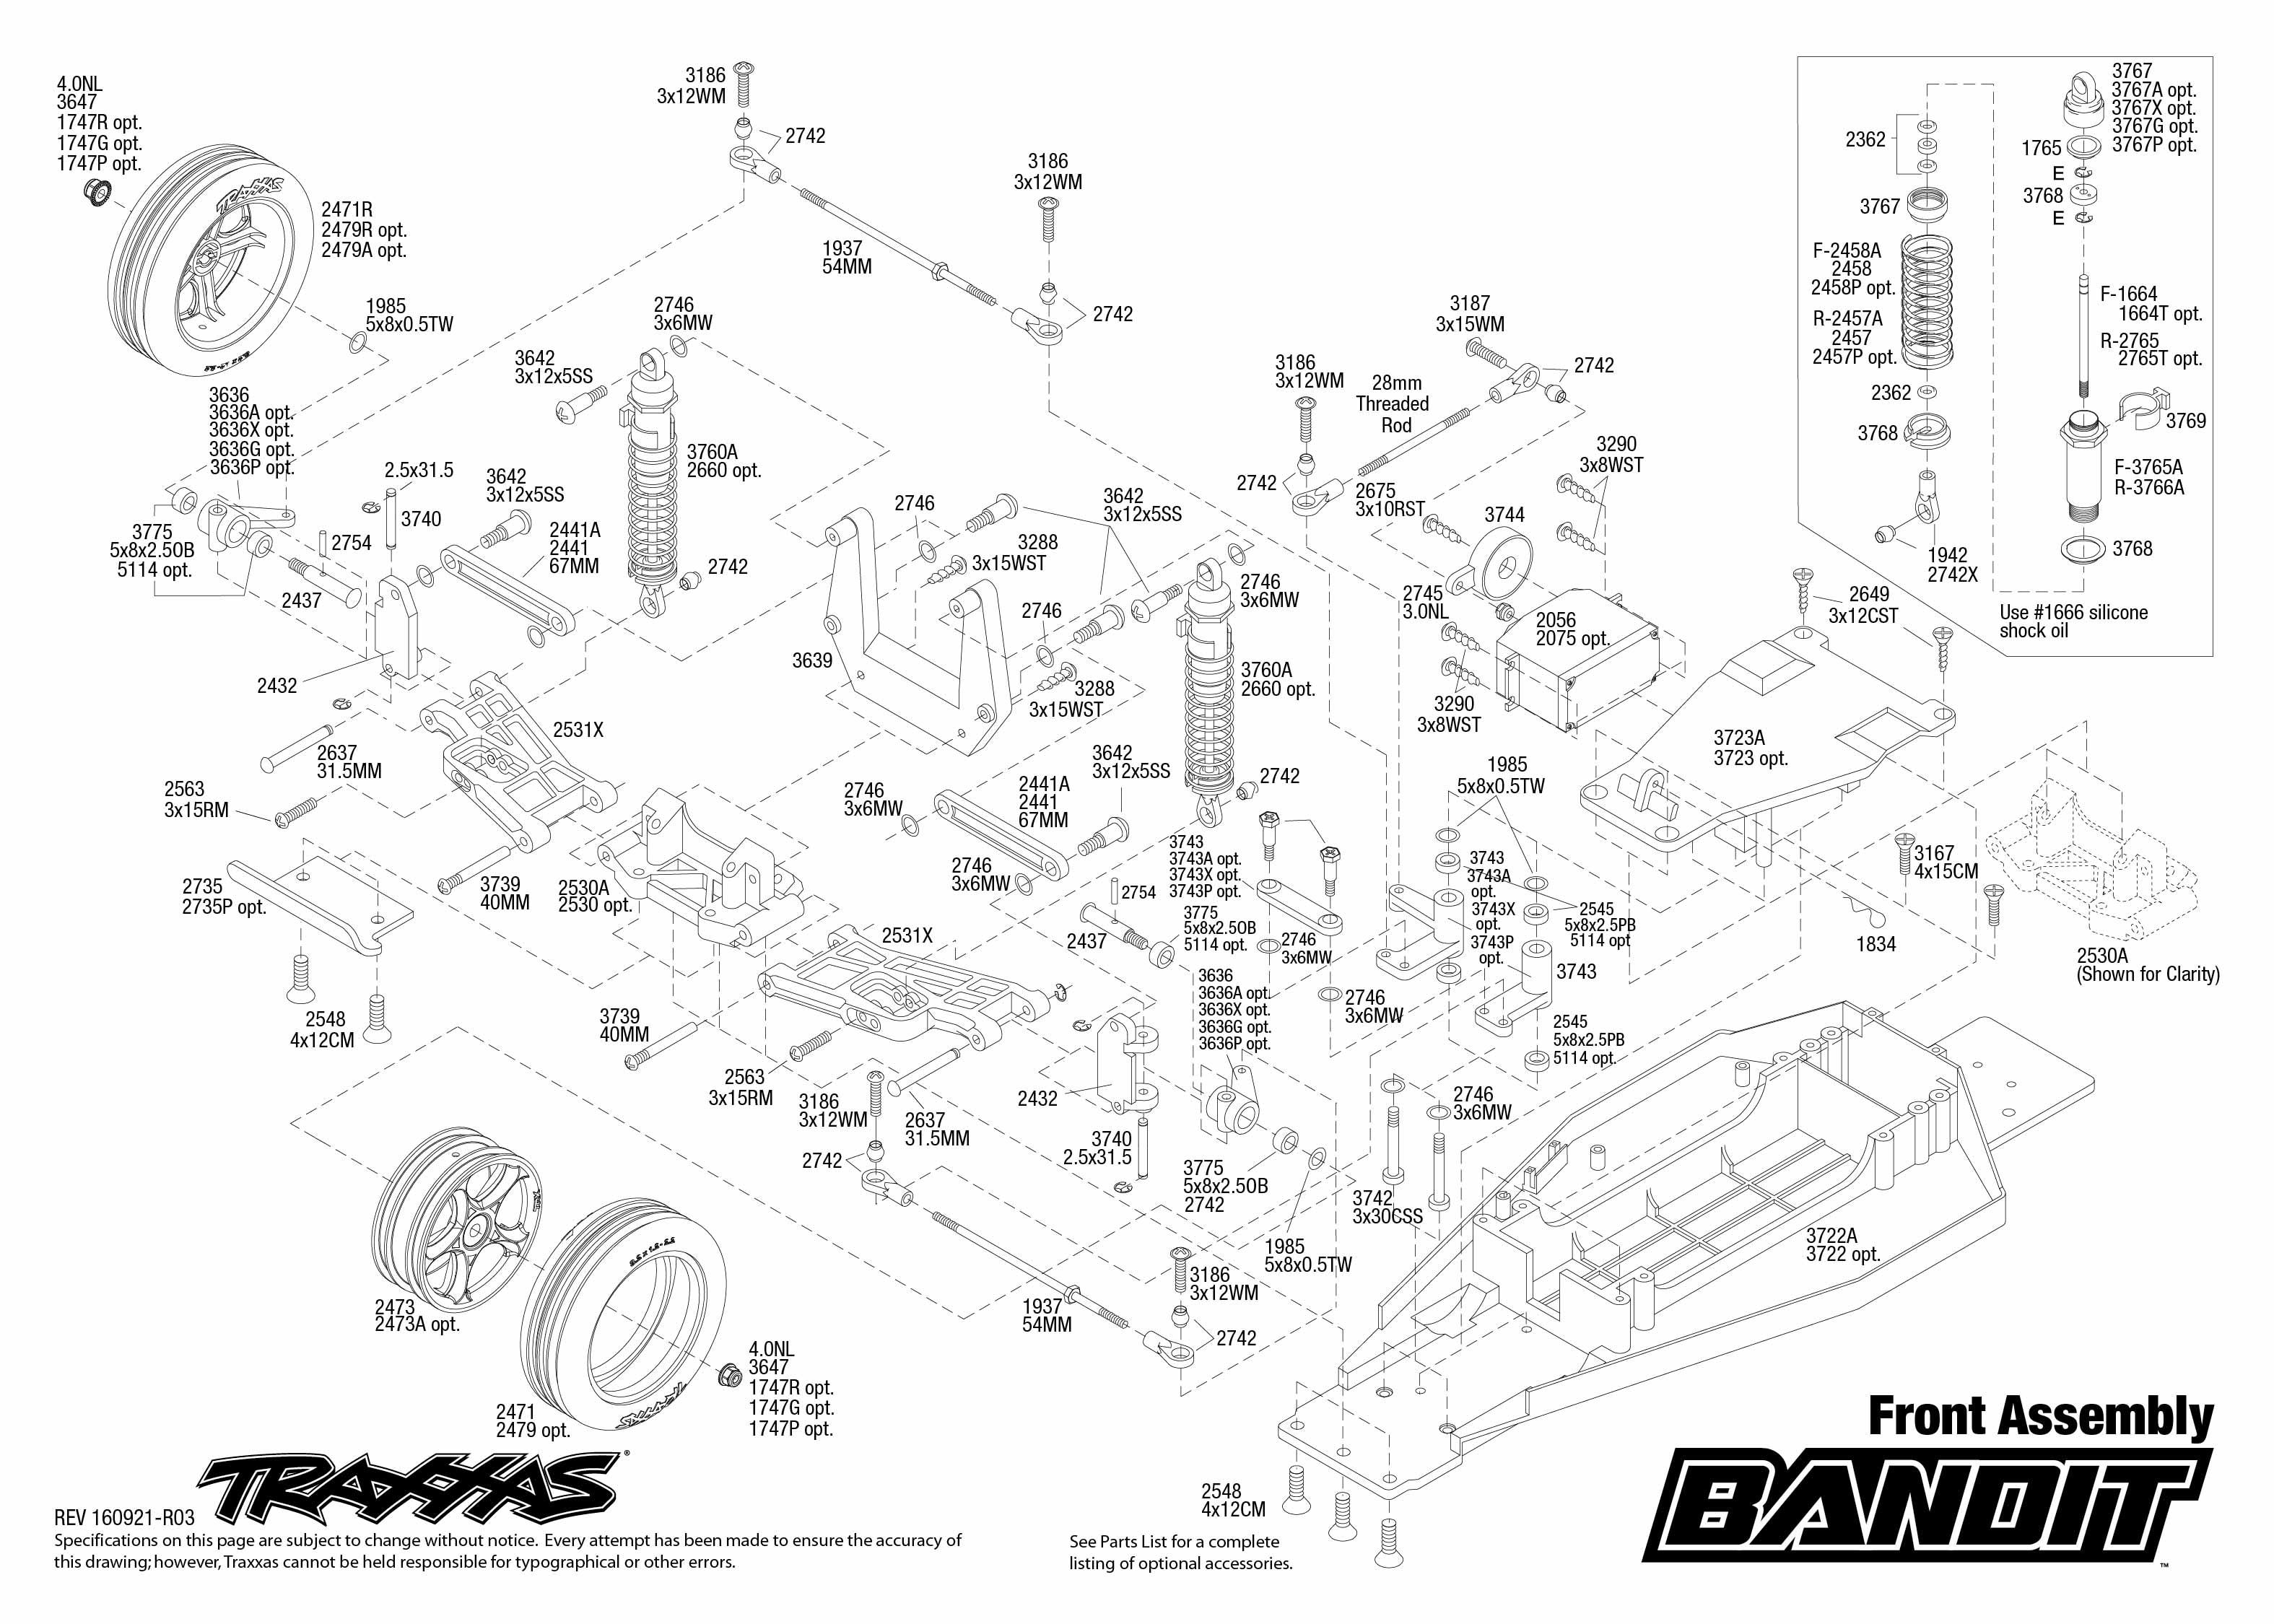 Revo 3 Engine Diagram Electrical Wiring Diagrams Toyota Traxxas Free Download